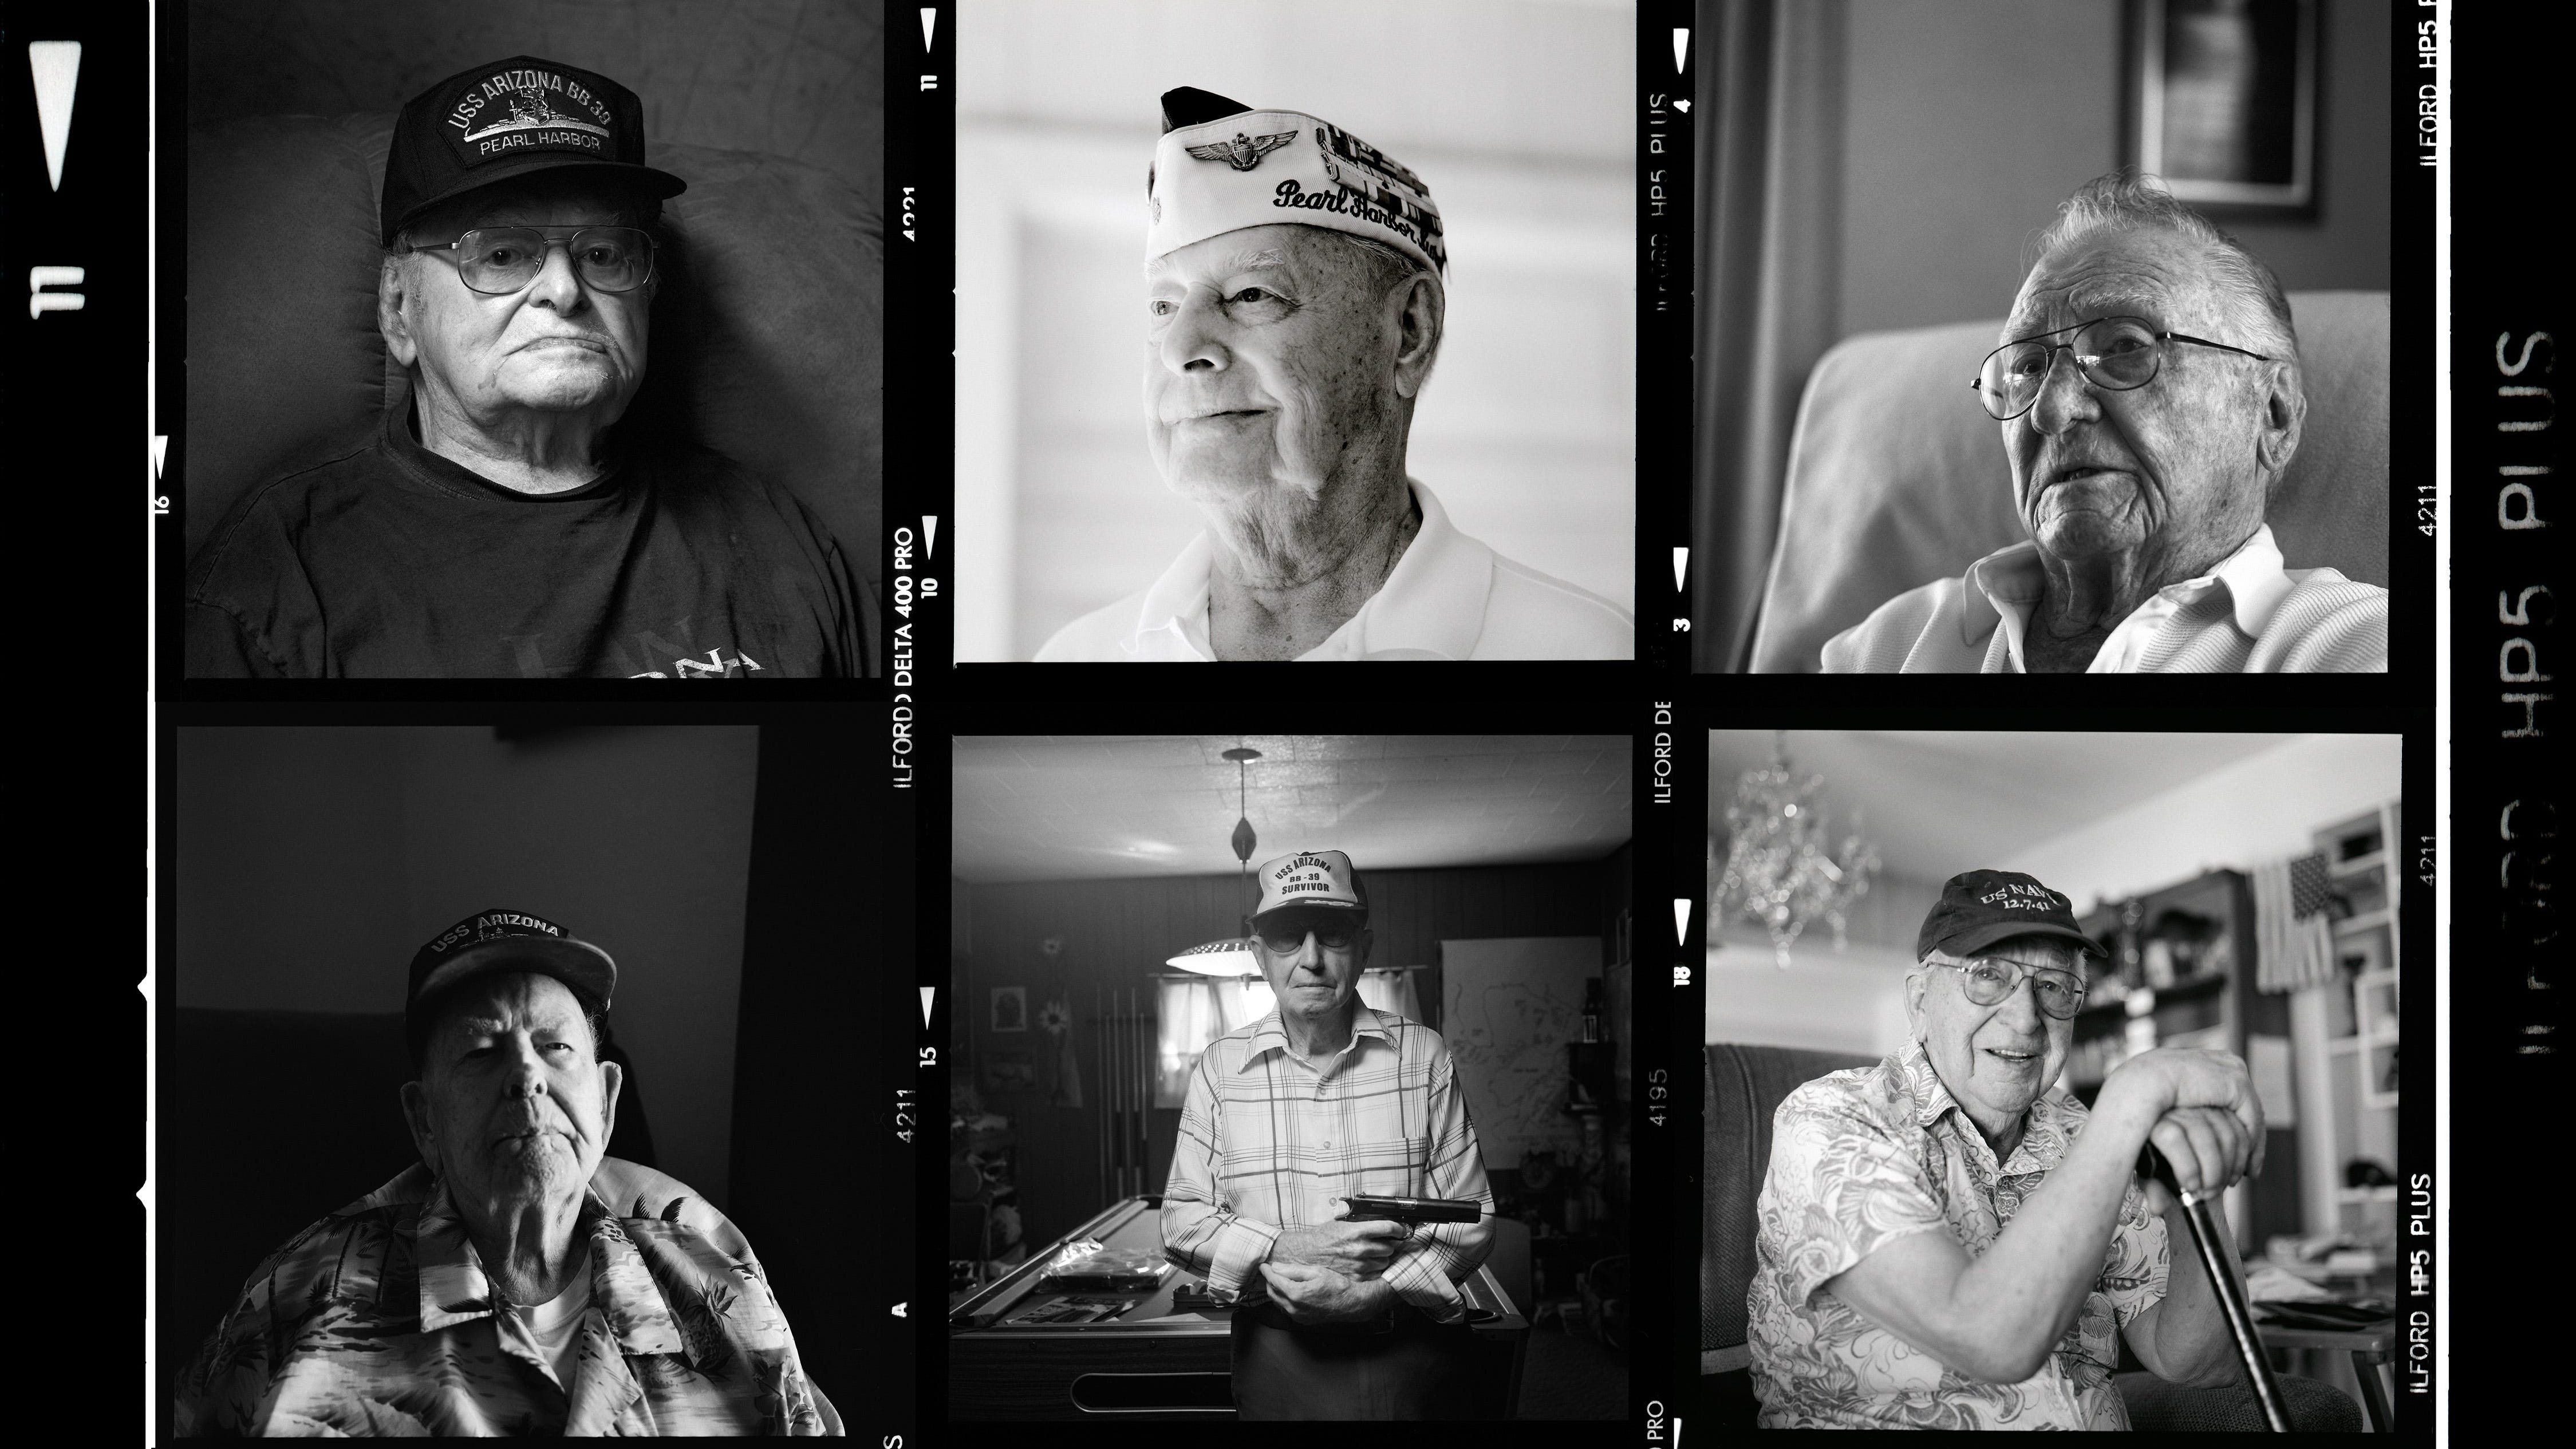 USS Arizona: The men who survived